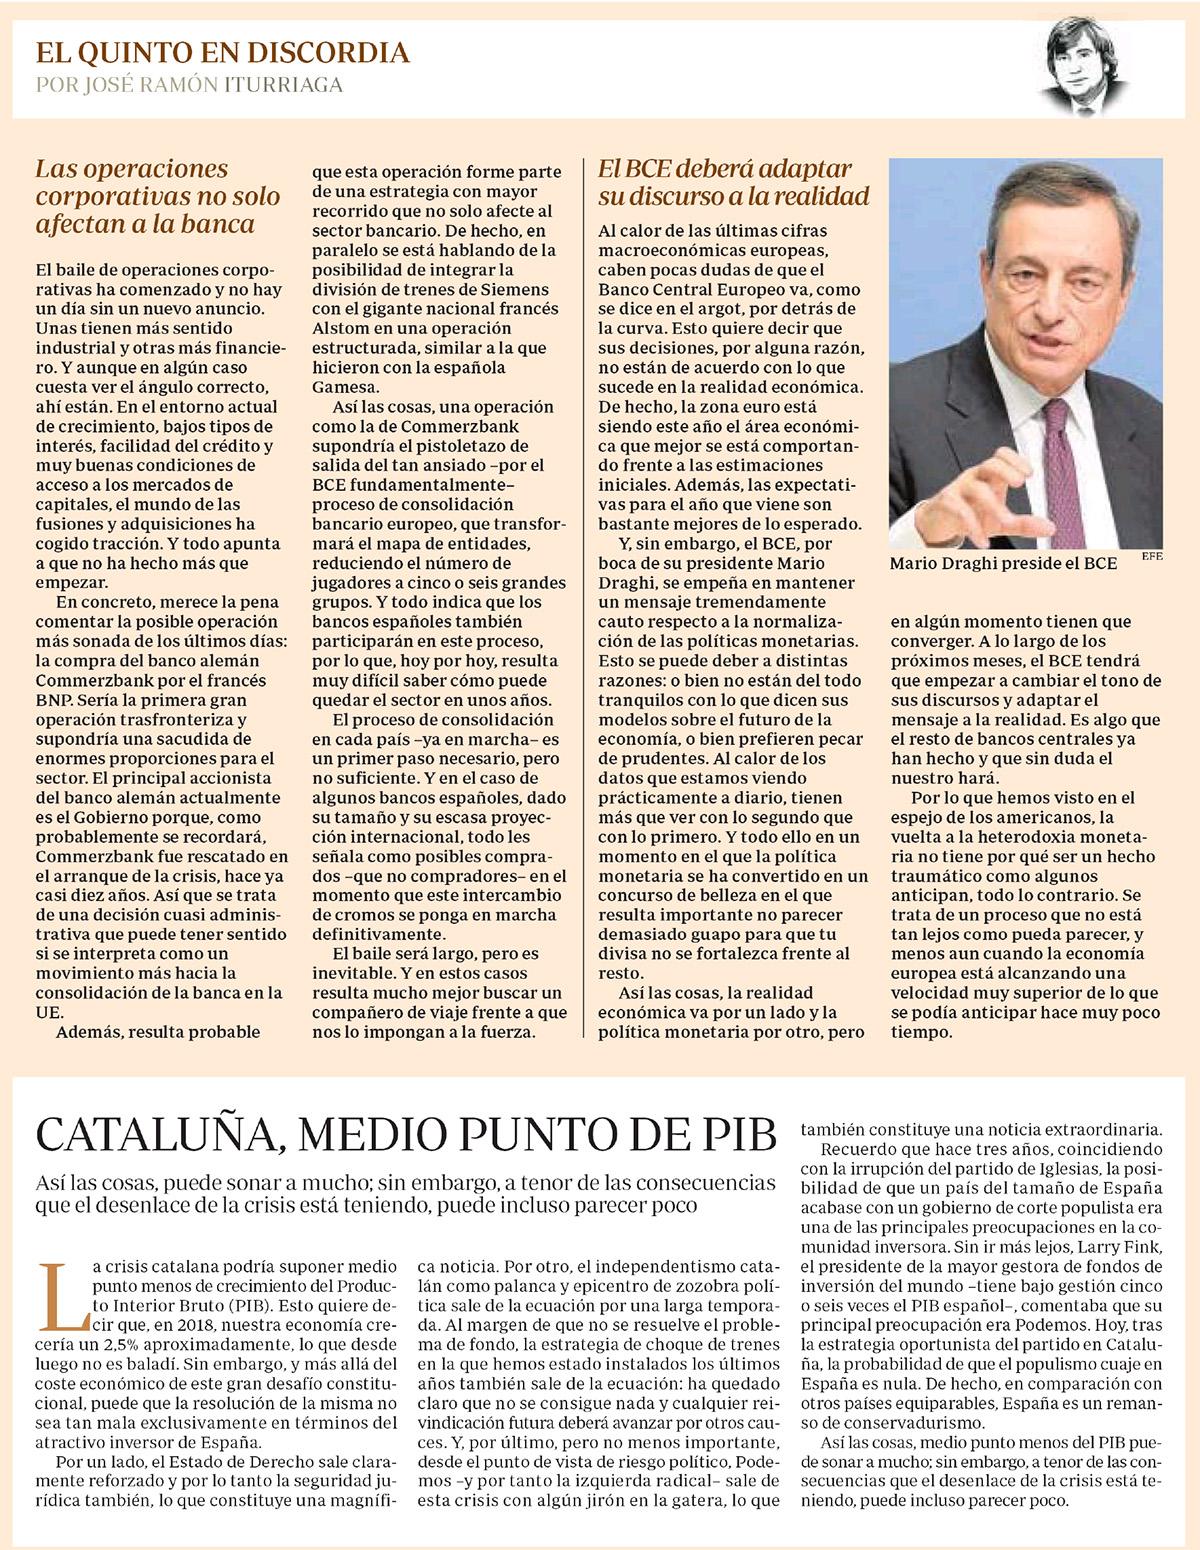 ABC Ituriaga EQED operaciones, BCE y Cataluña